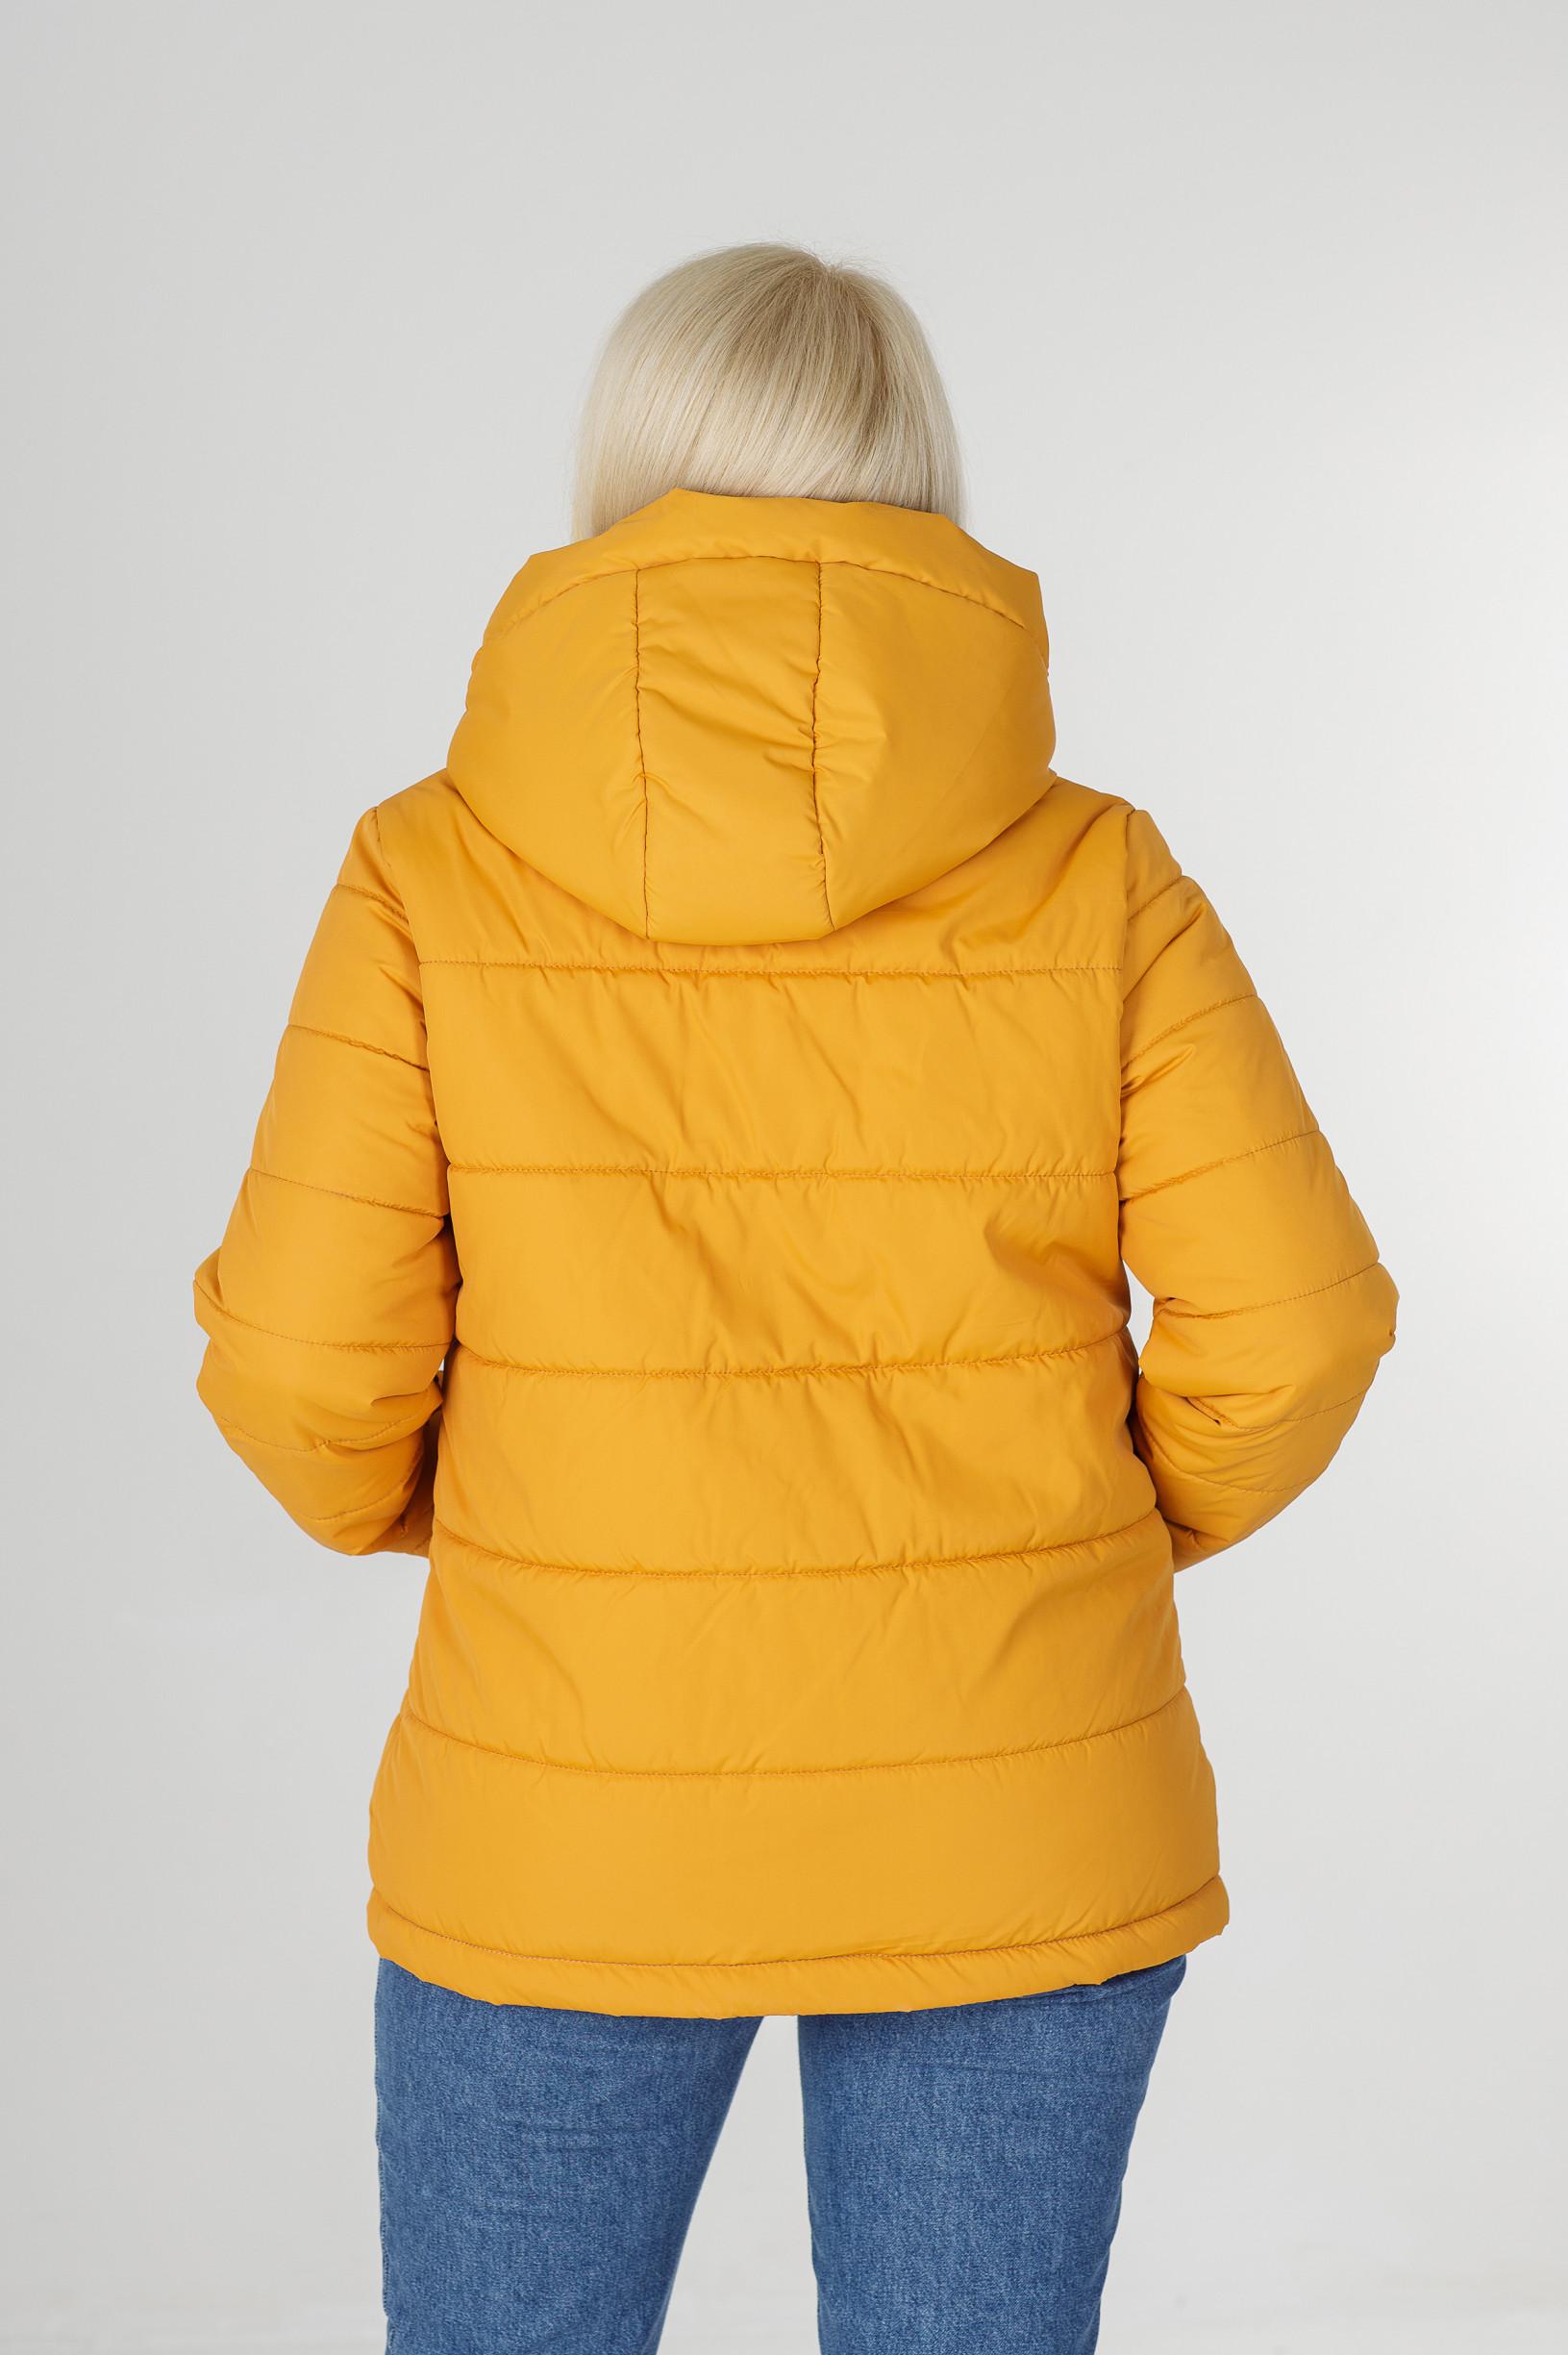 Женская жёлтая весенняя куртка Дина